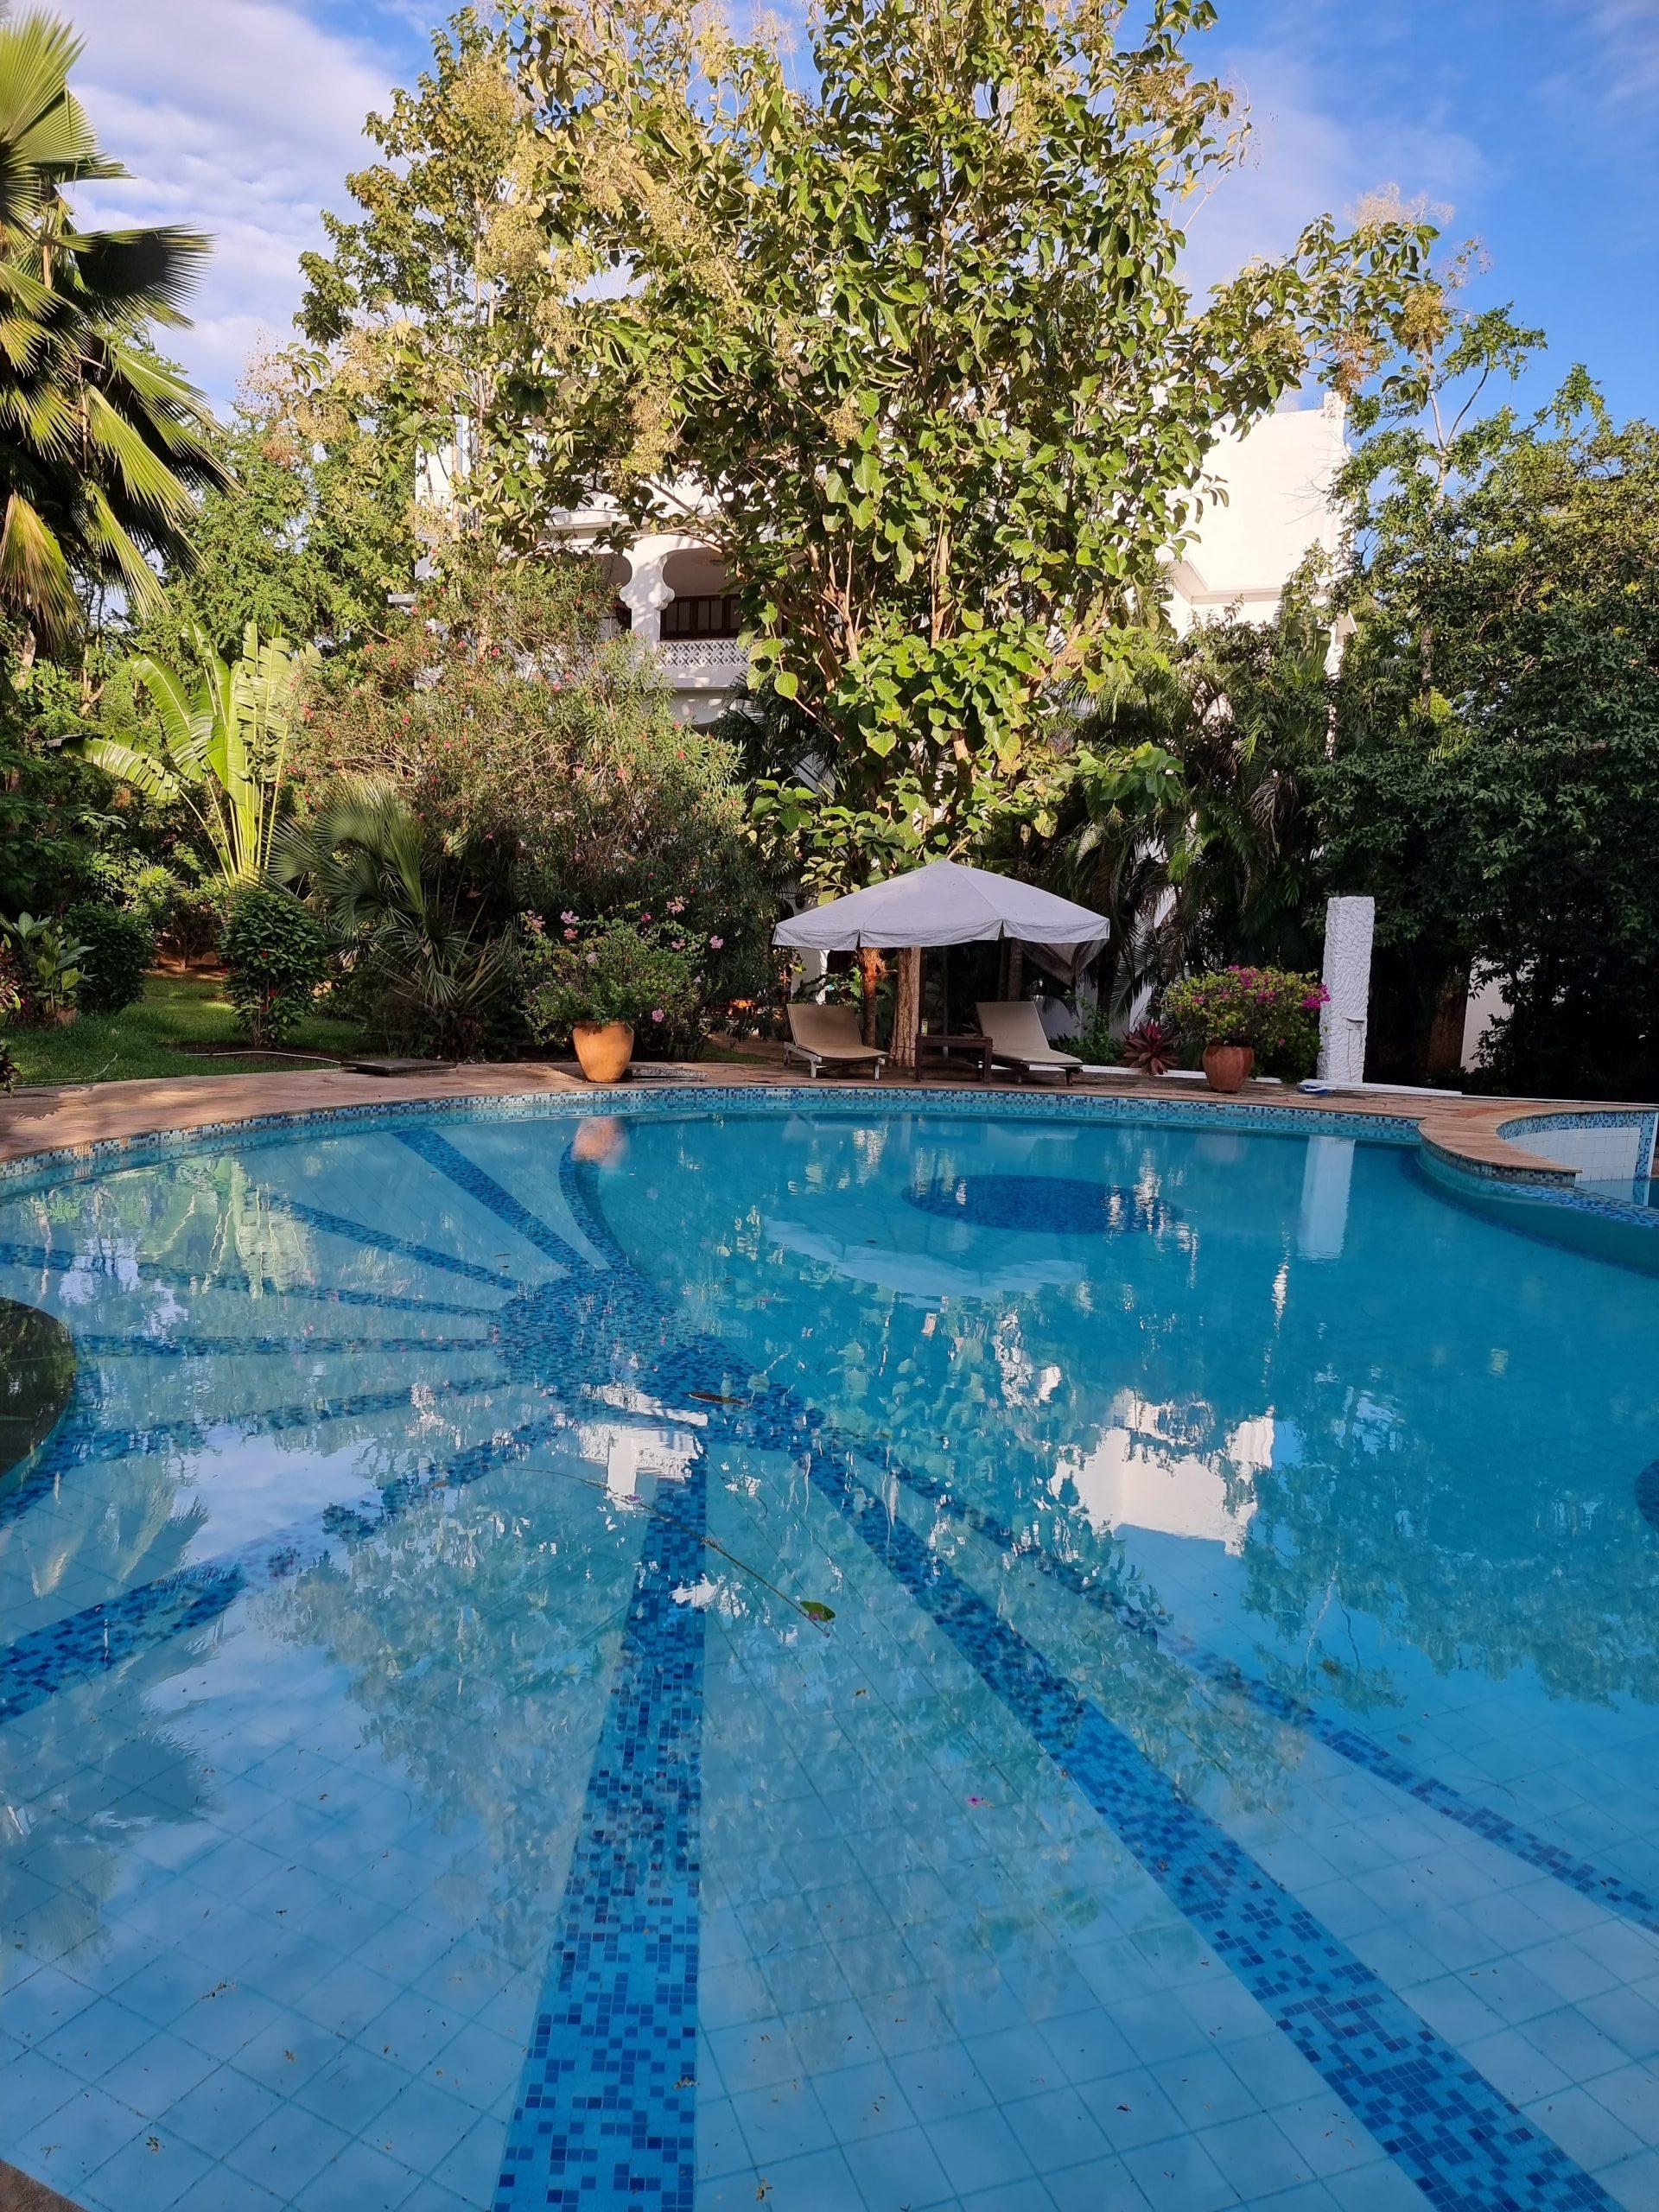 3br Kenya Marina apartments for Rent in mtwapa